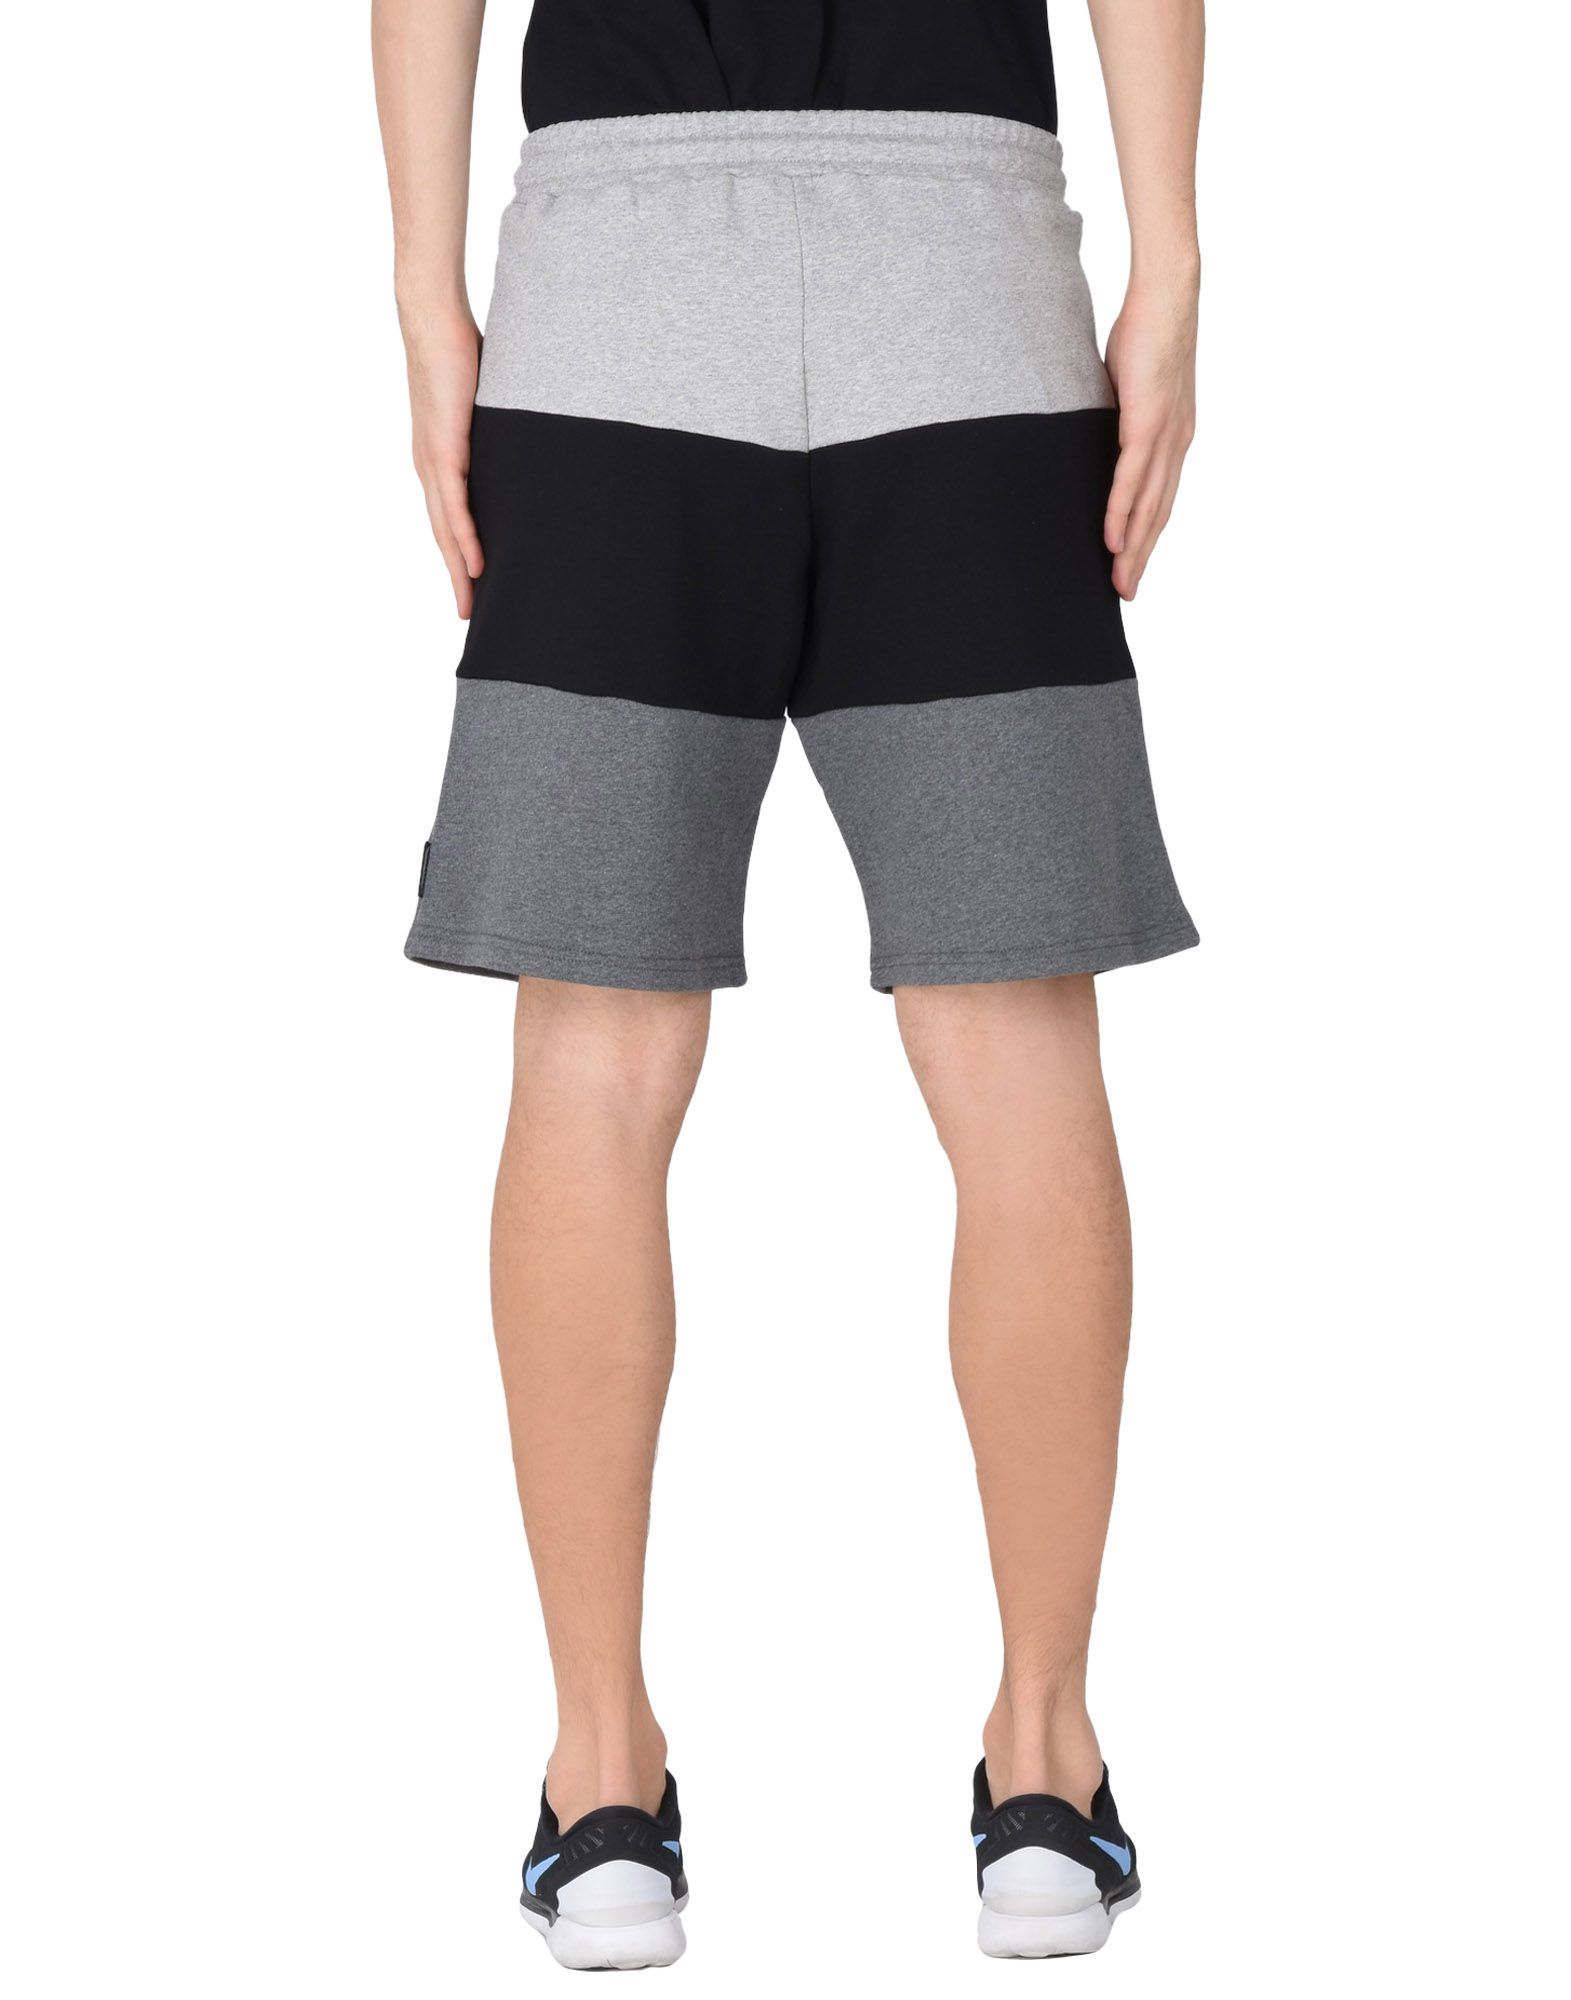 Pantalone Felpa Stripes Iuter Rule Shorts Stripes Felpa Insert Sweatshorts - Uomo - 36984120QE 04a5a4